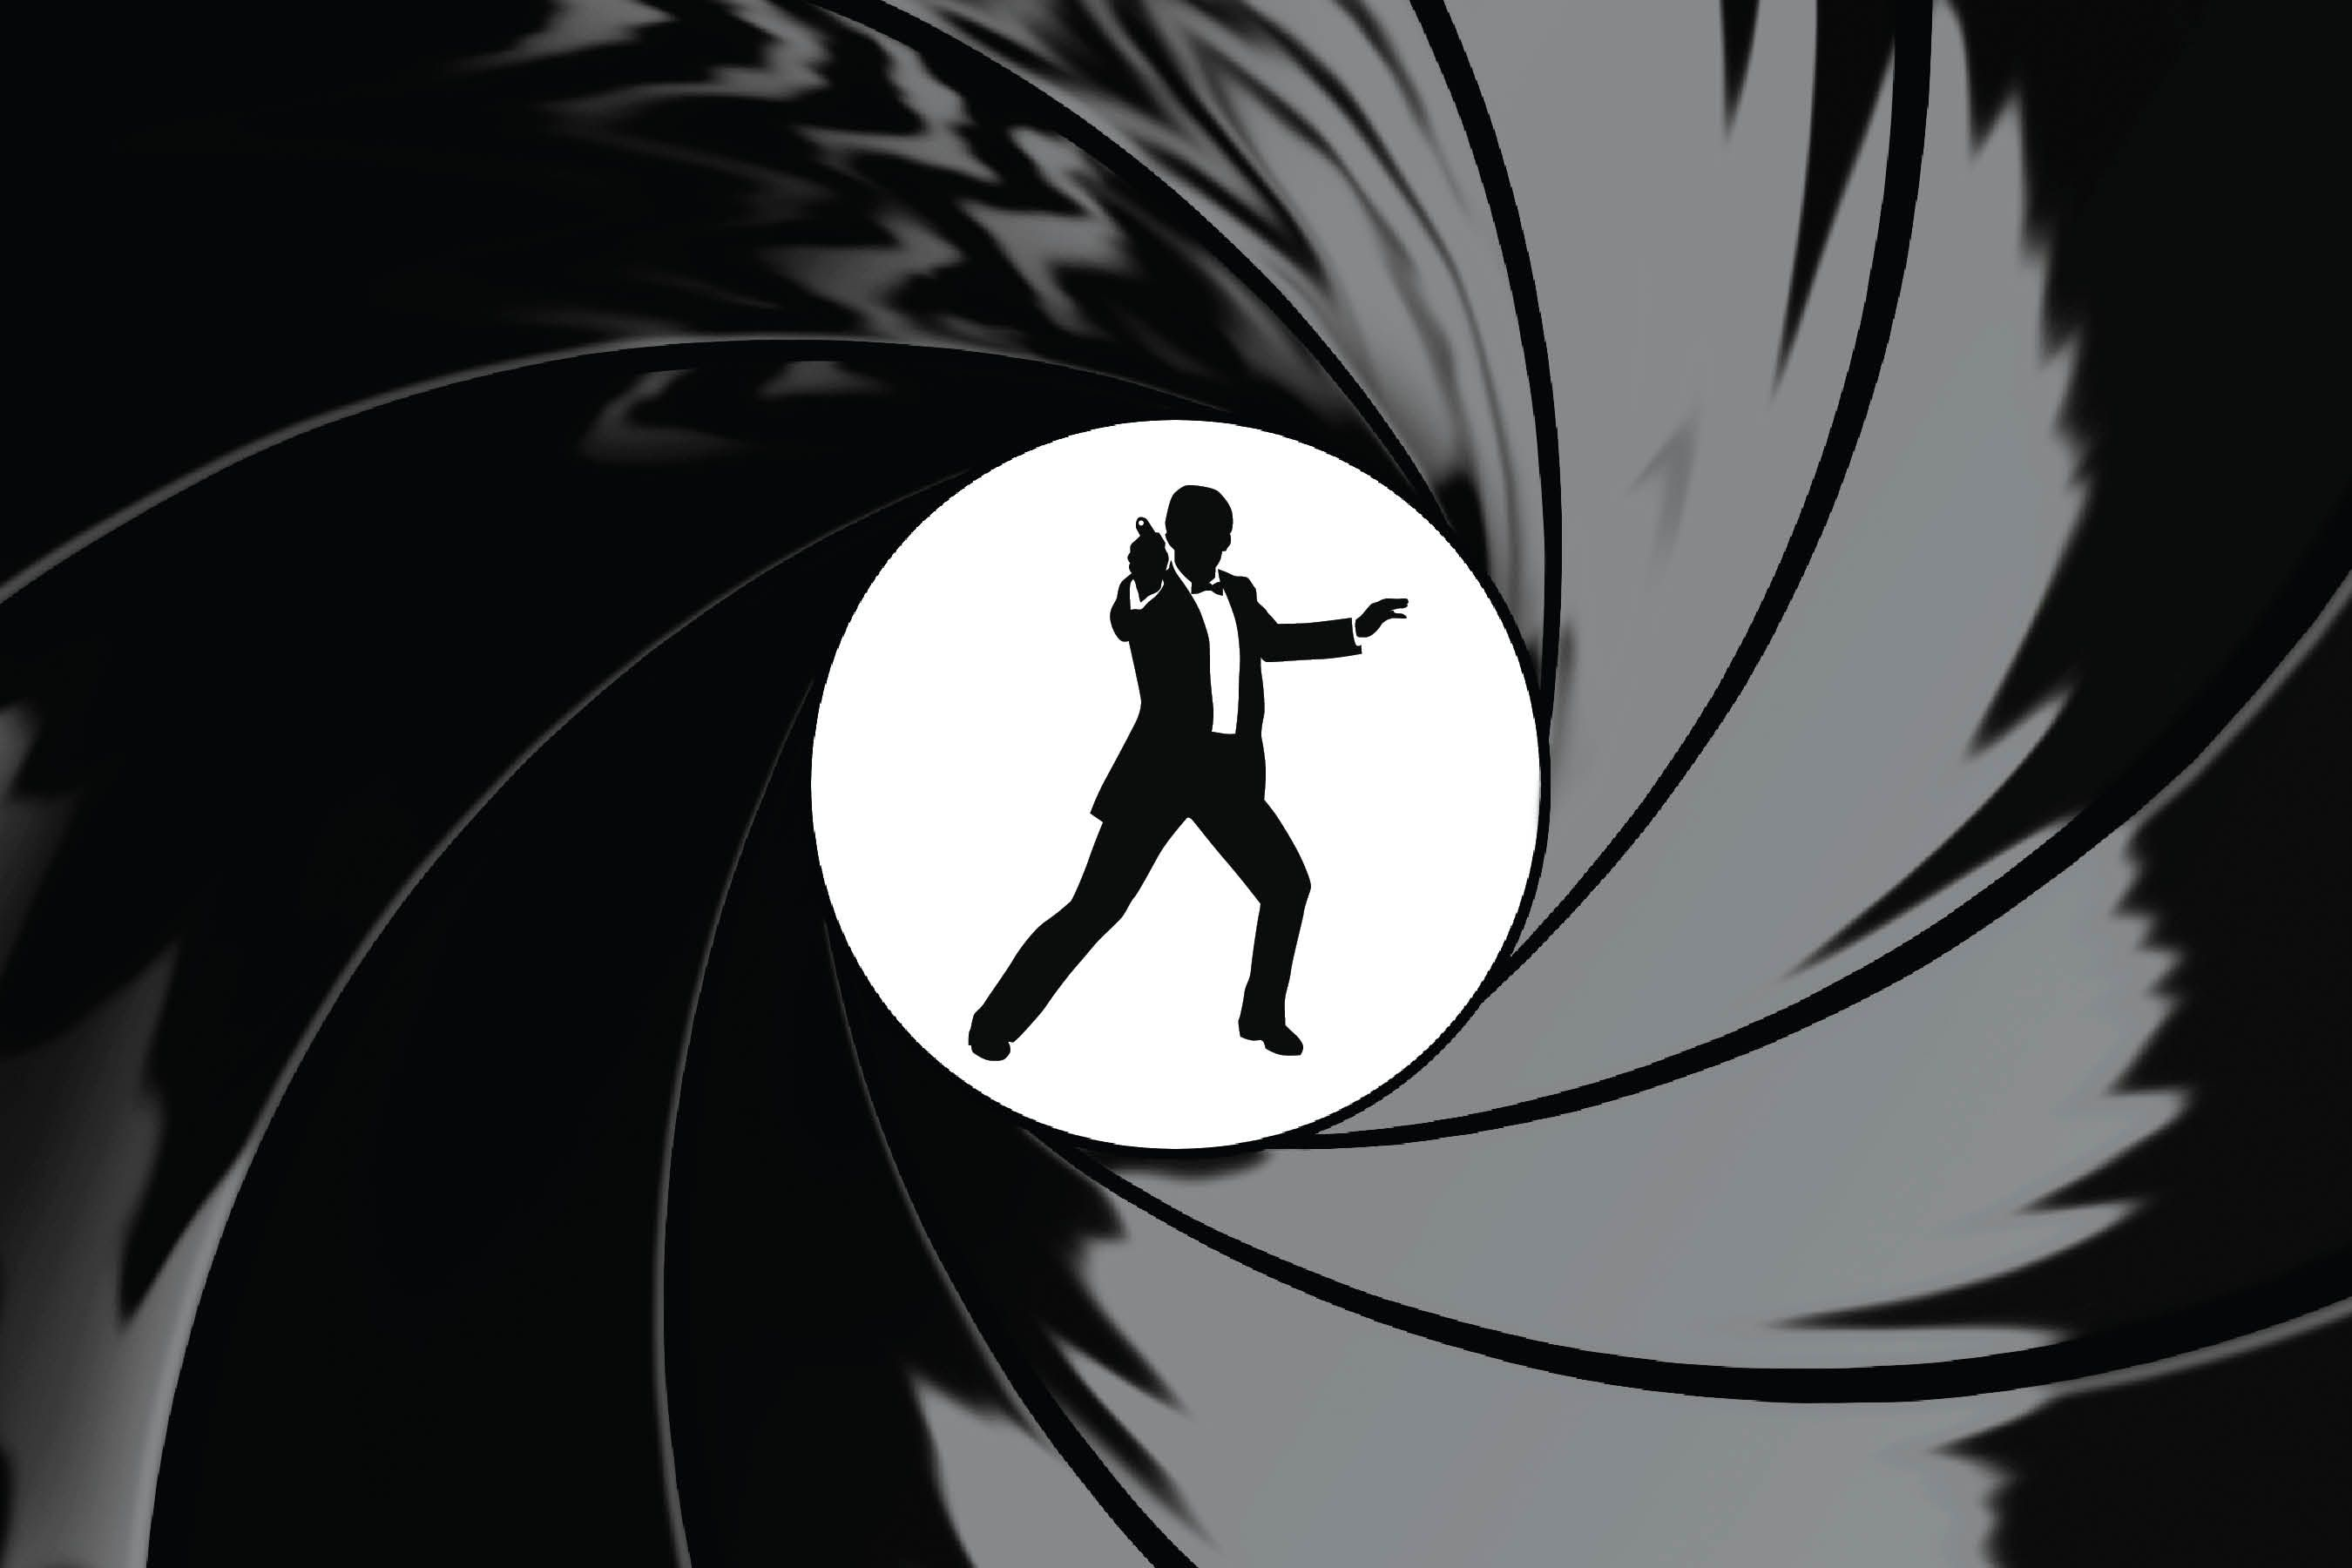 Cool James Bond Wallpaper Wallpaper Basic Background 2700x1800